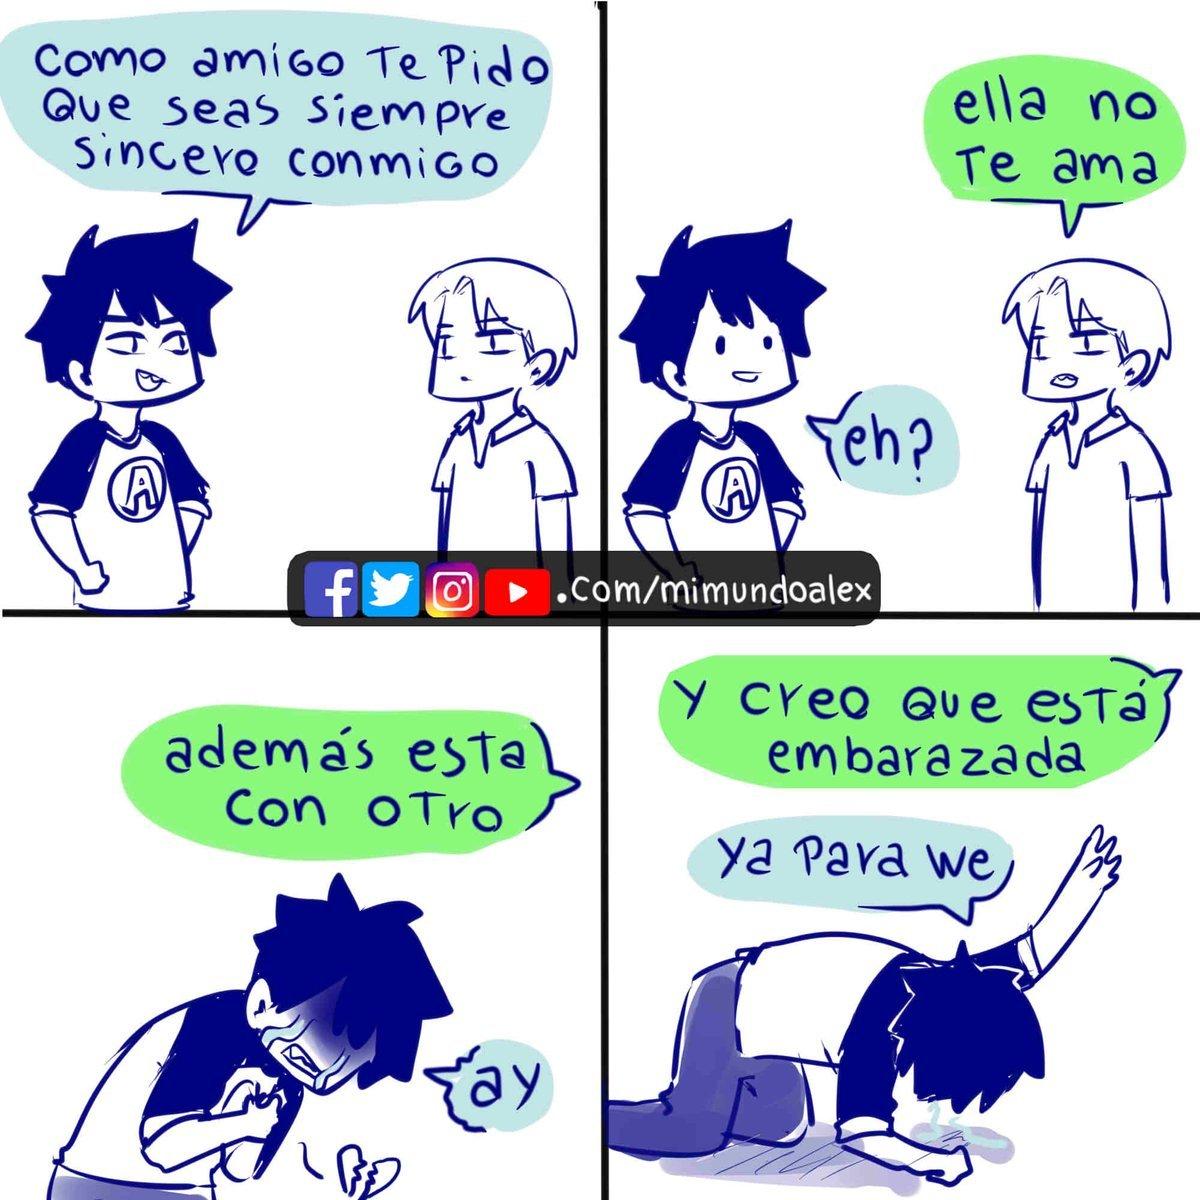 stop por favor - meme